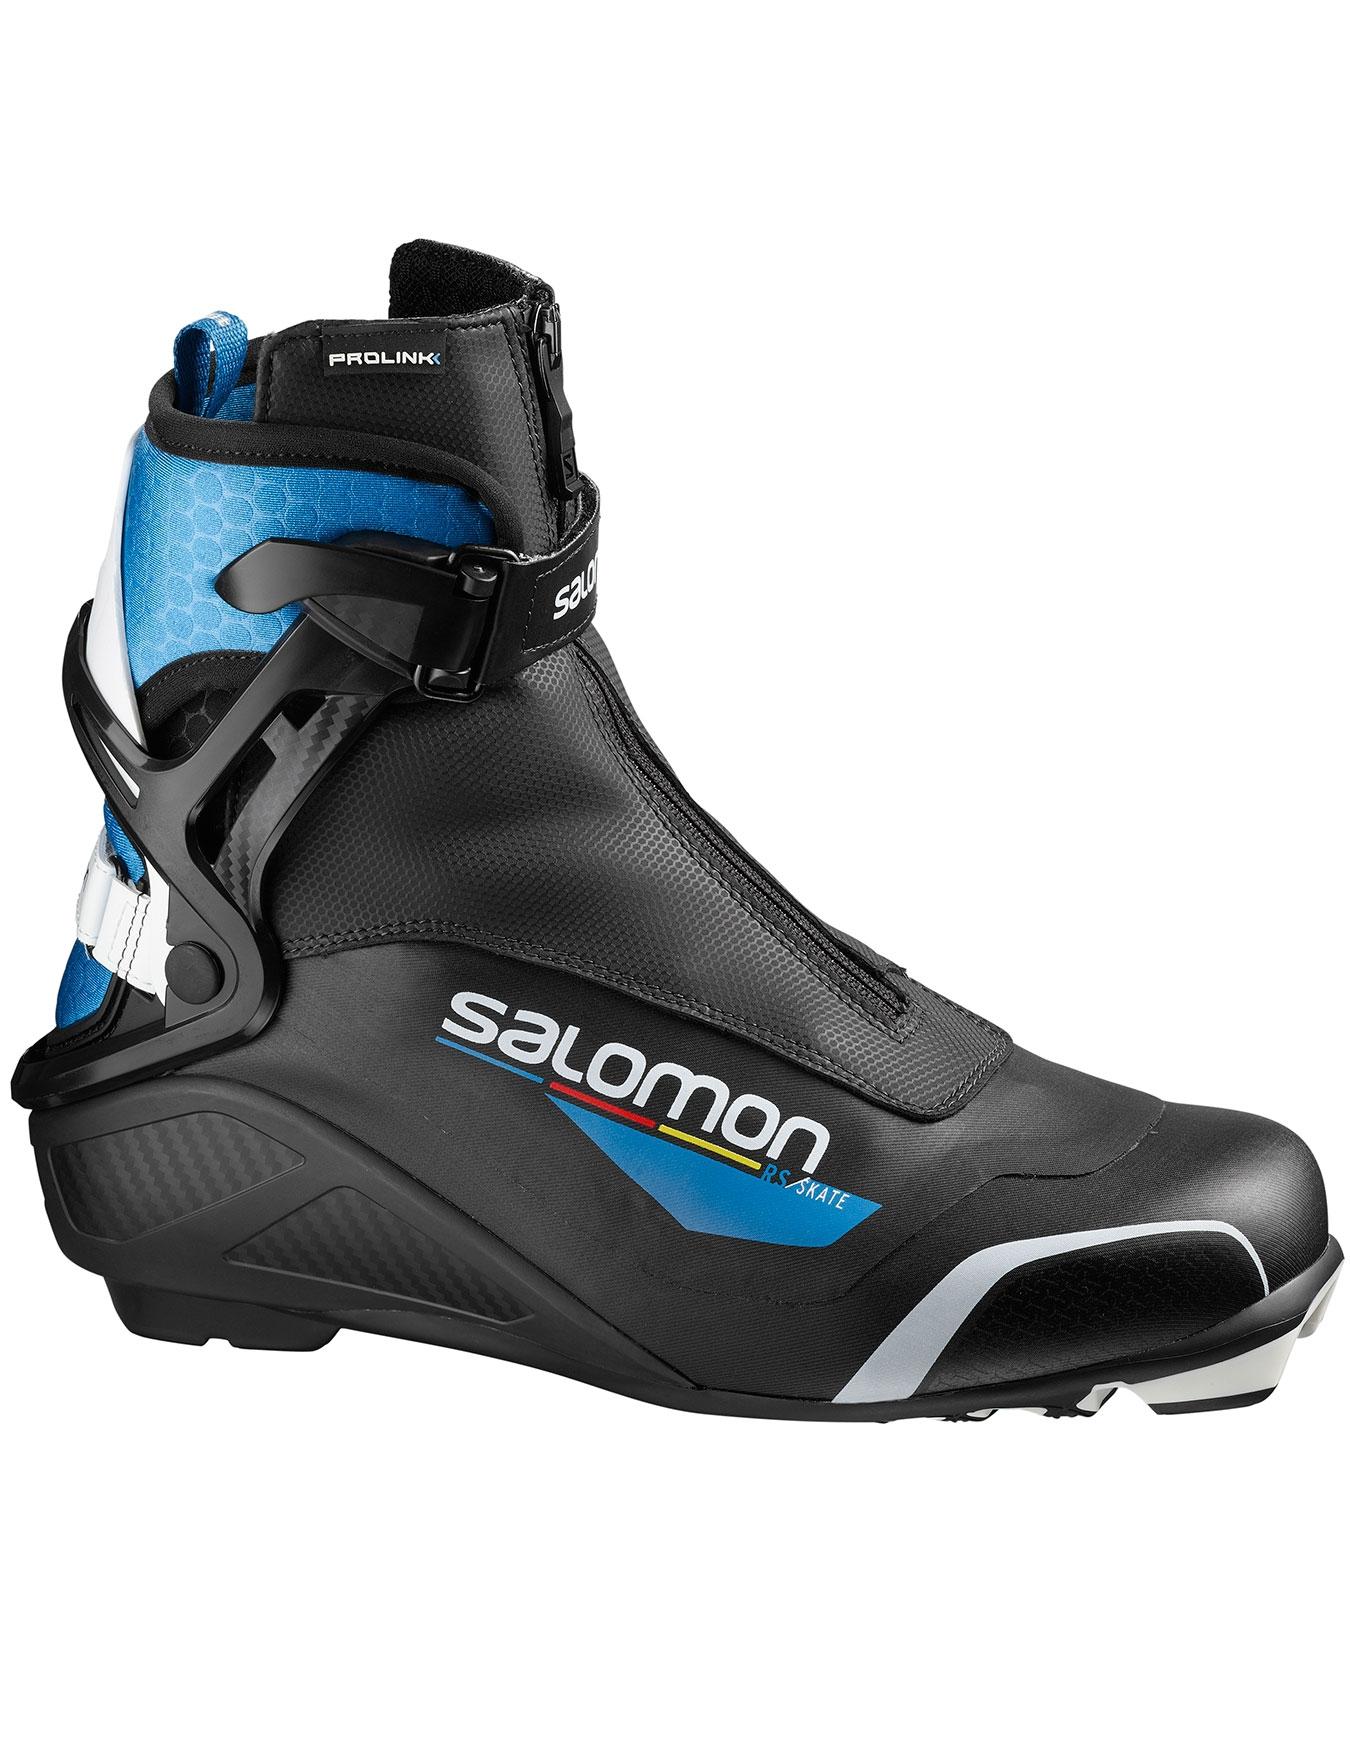 Chaussures RS VITANE PROLINK 2020 Skating | Sport et Neige